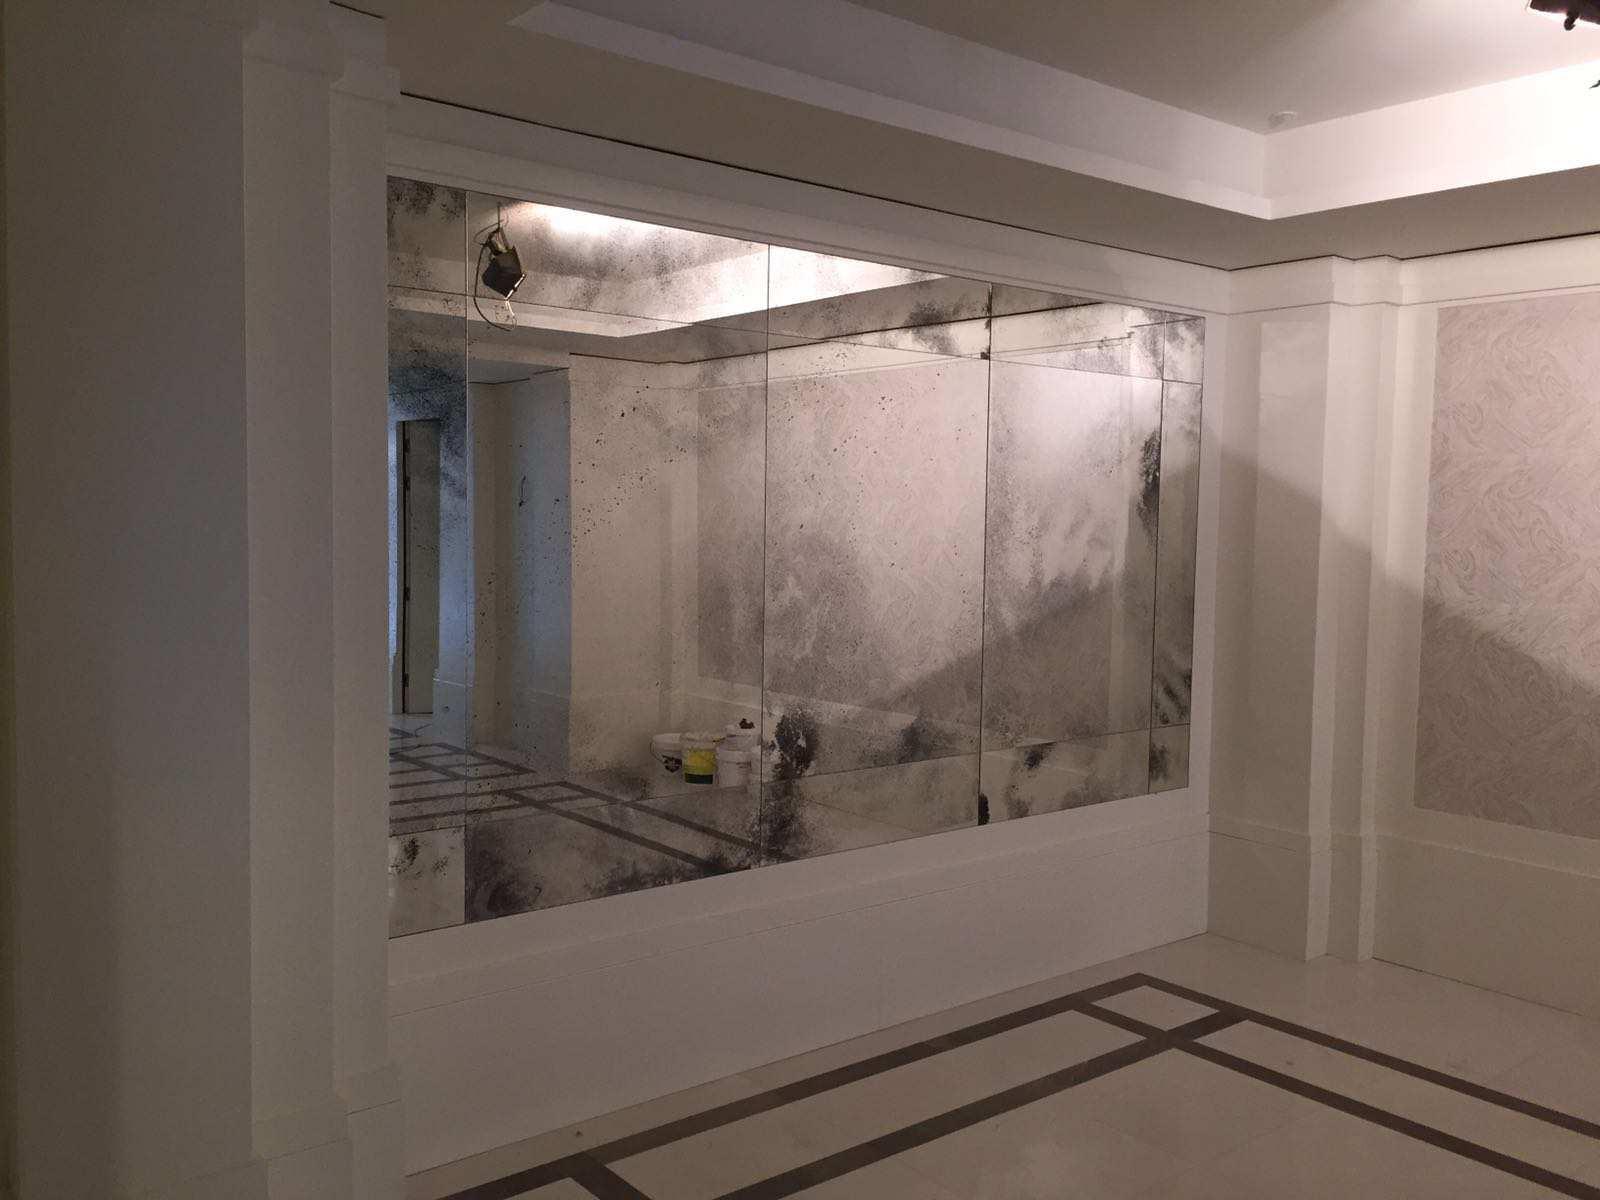 Vidrio design madrid todo en vidrio de dise o for Espejo envejecido